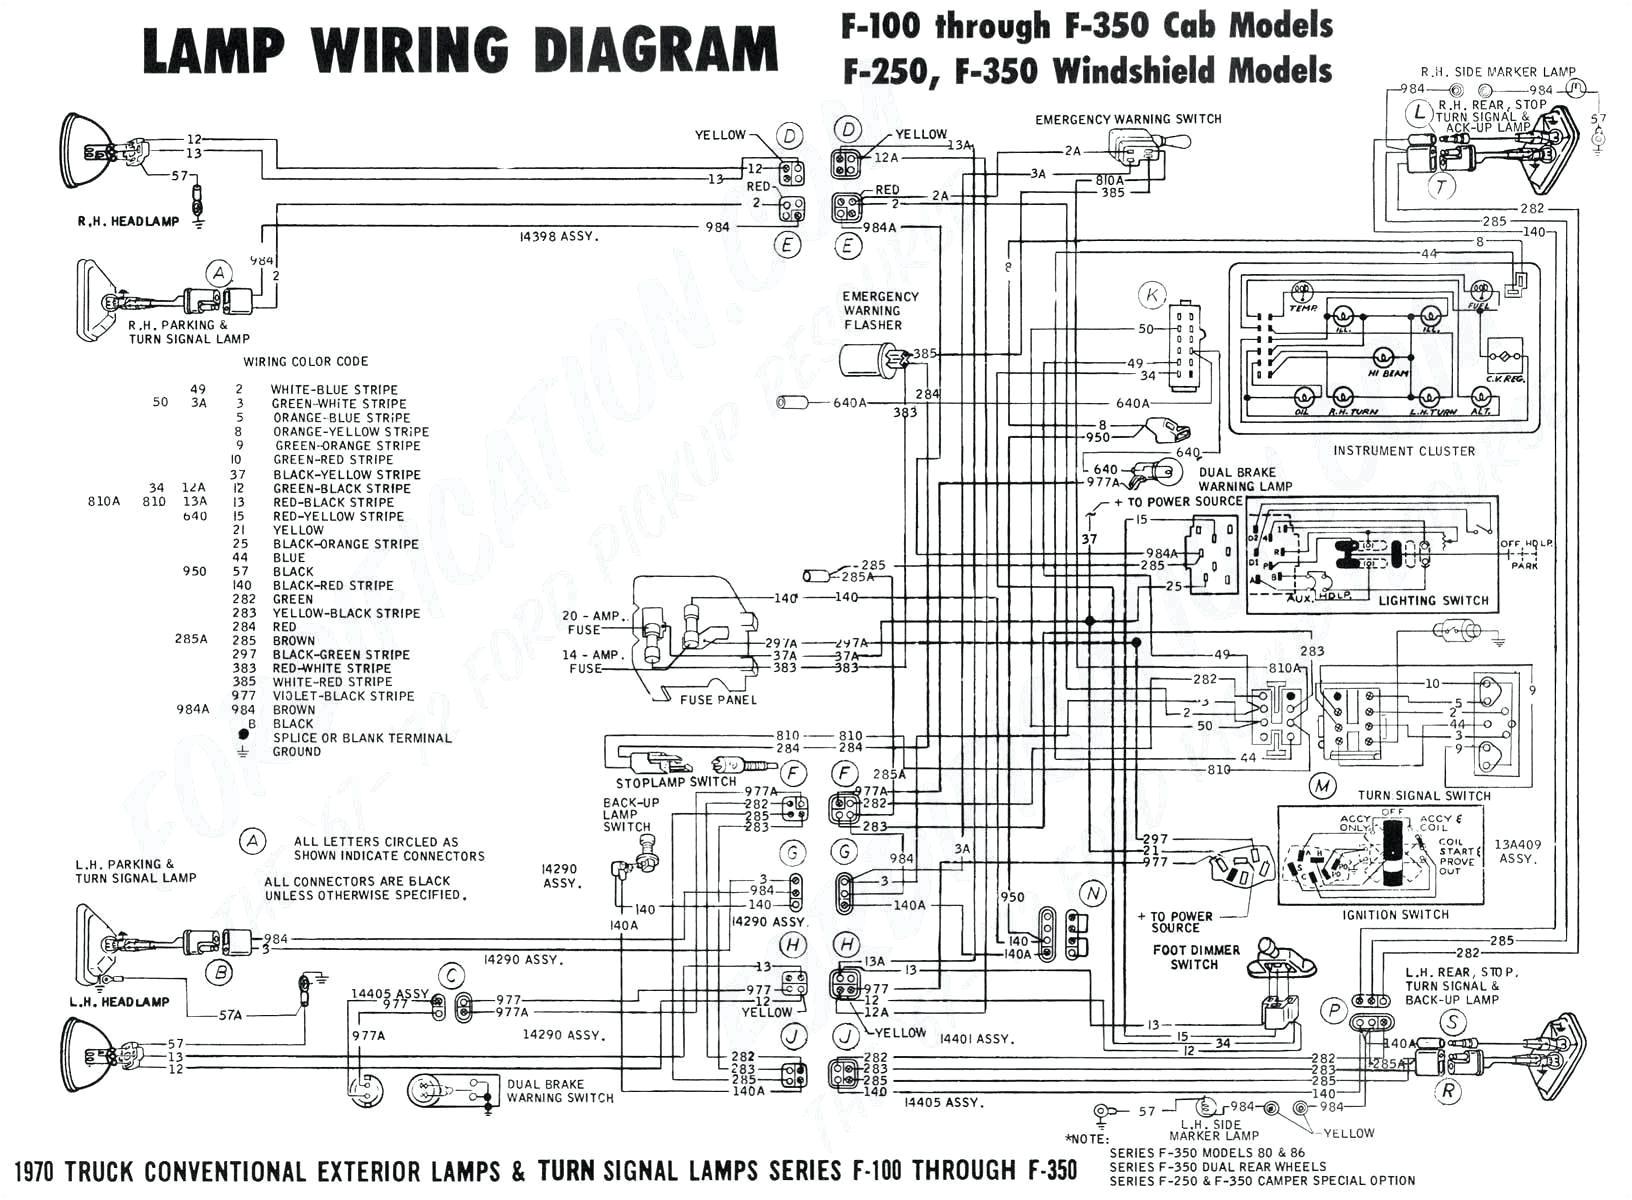 14 chevy silverado wiring diagram wiring diagram database wiring diagram for 2005 chevy silverado radio wiring diagram for 2005 chevy silverado